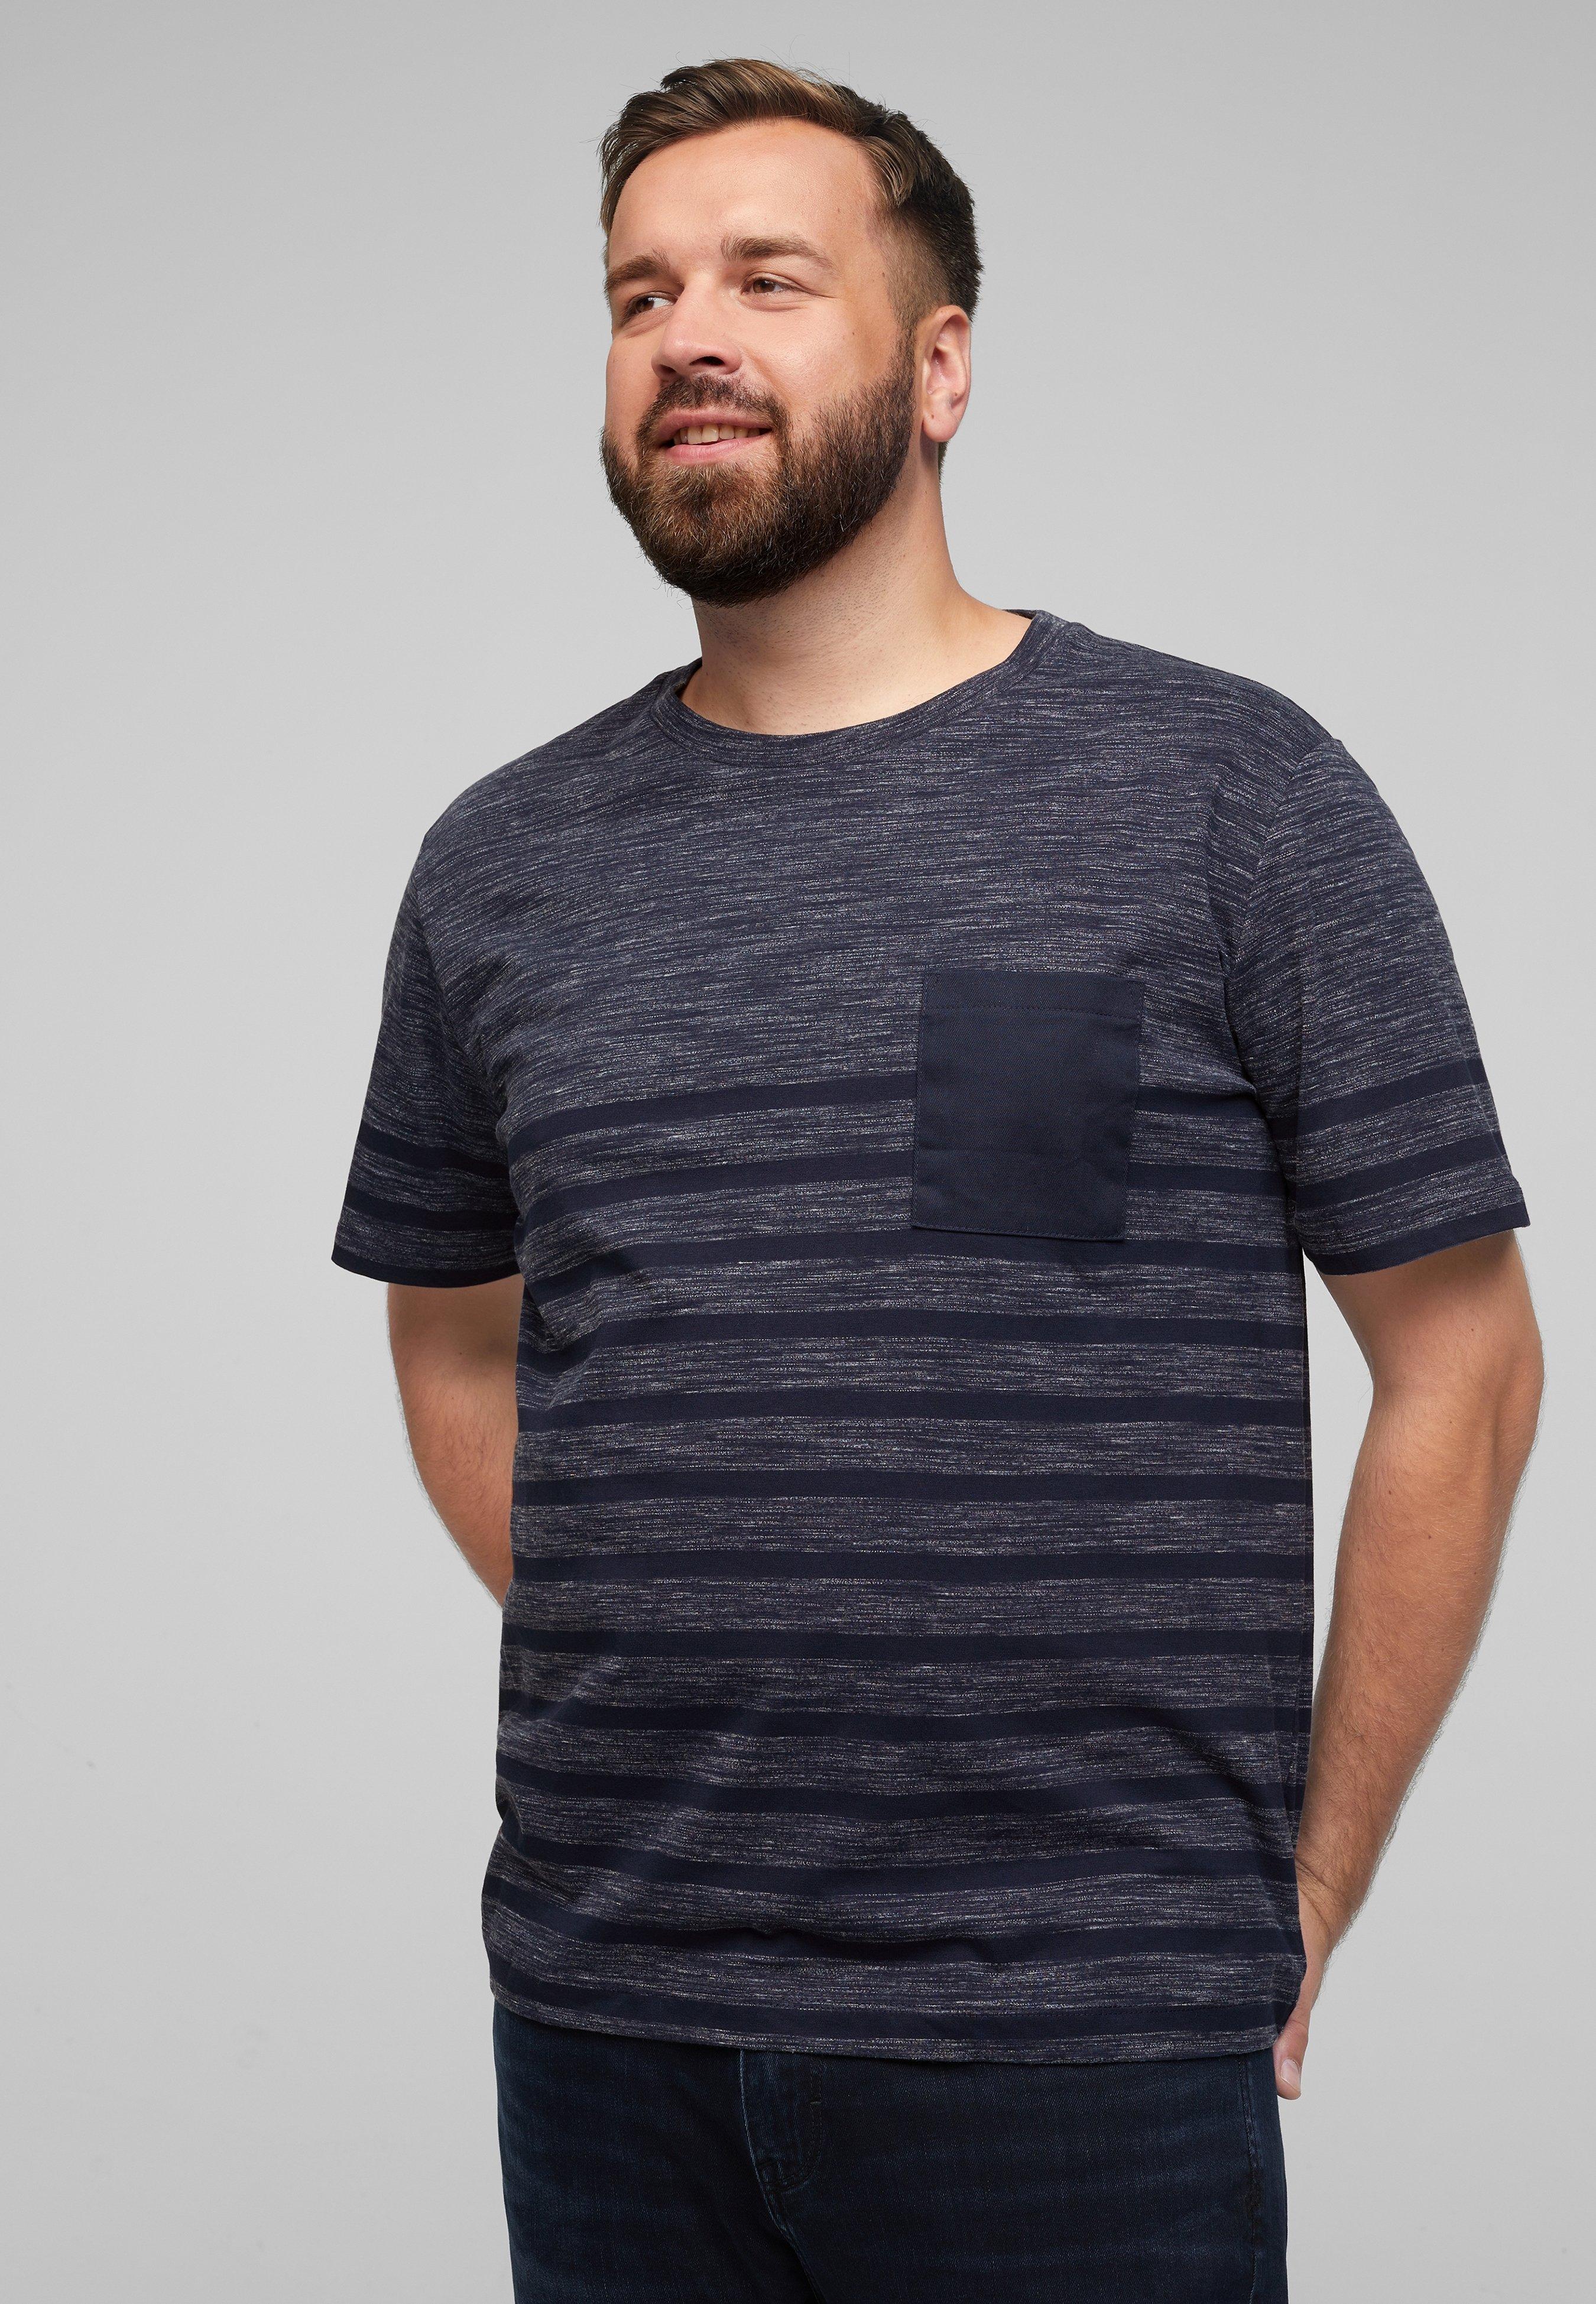 Homme GEWEBTER BRUSTTASCHE - T-shirt imprimé